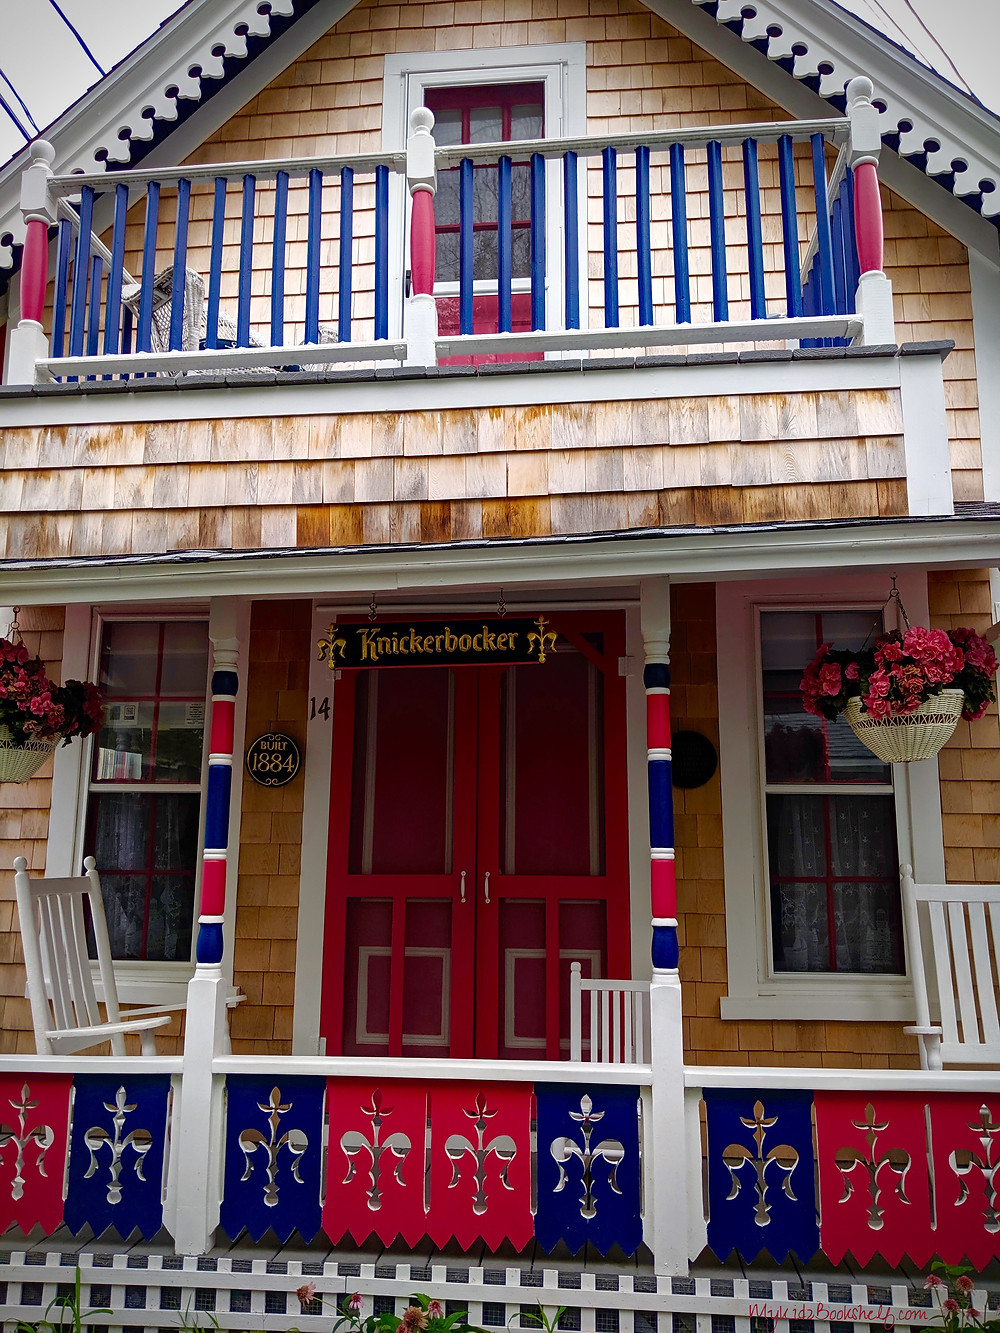 Gingerbread-Cottage-Seas-the-Day-at-Martha's-Vineyard-Oak-Bluffs